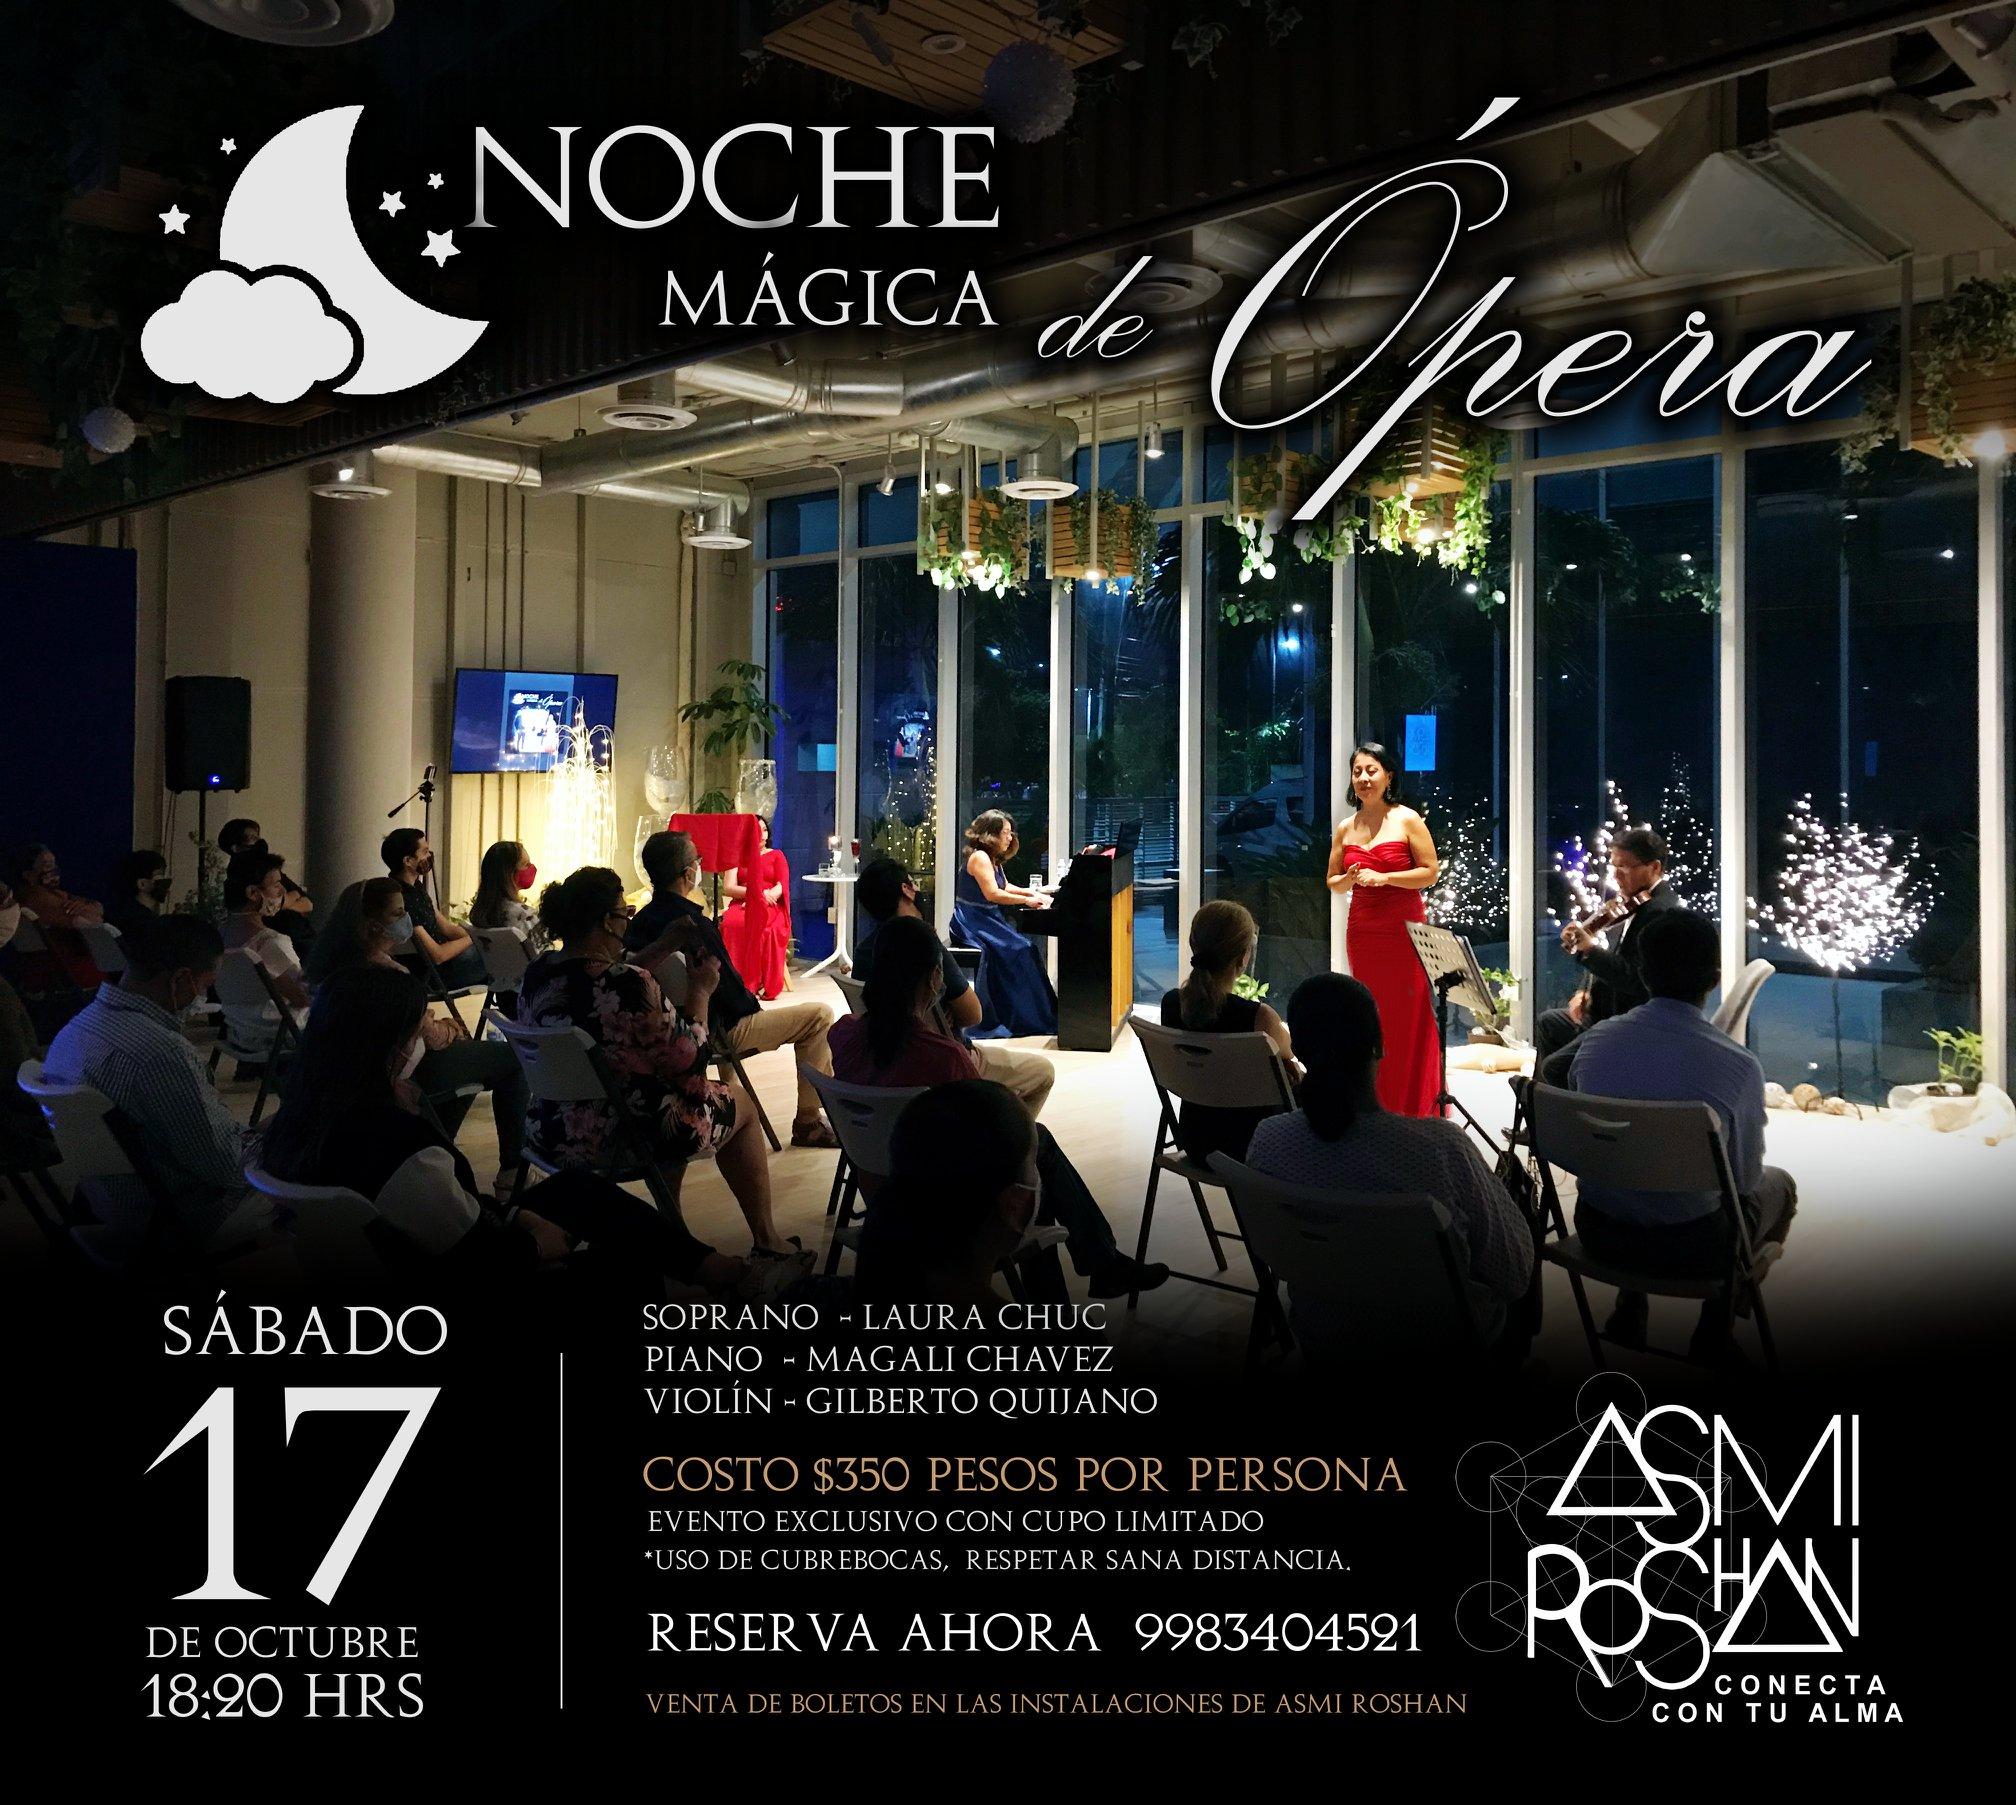 Noche Mágica de Opera II